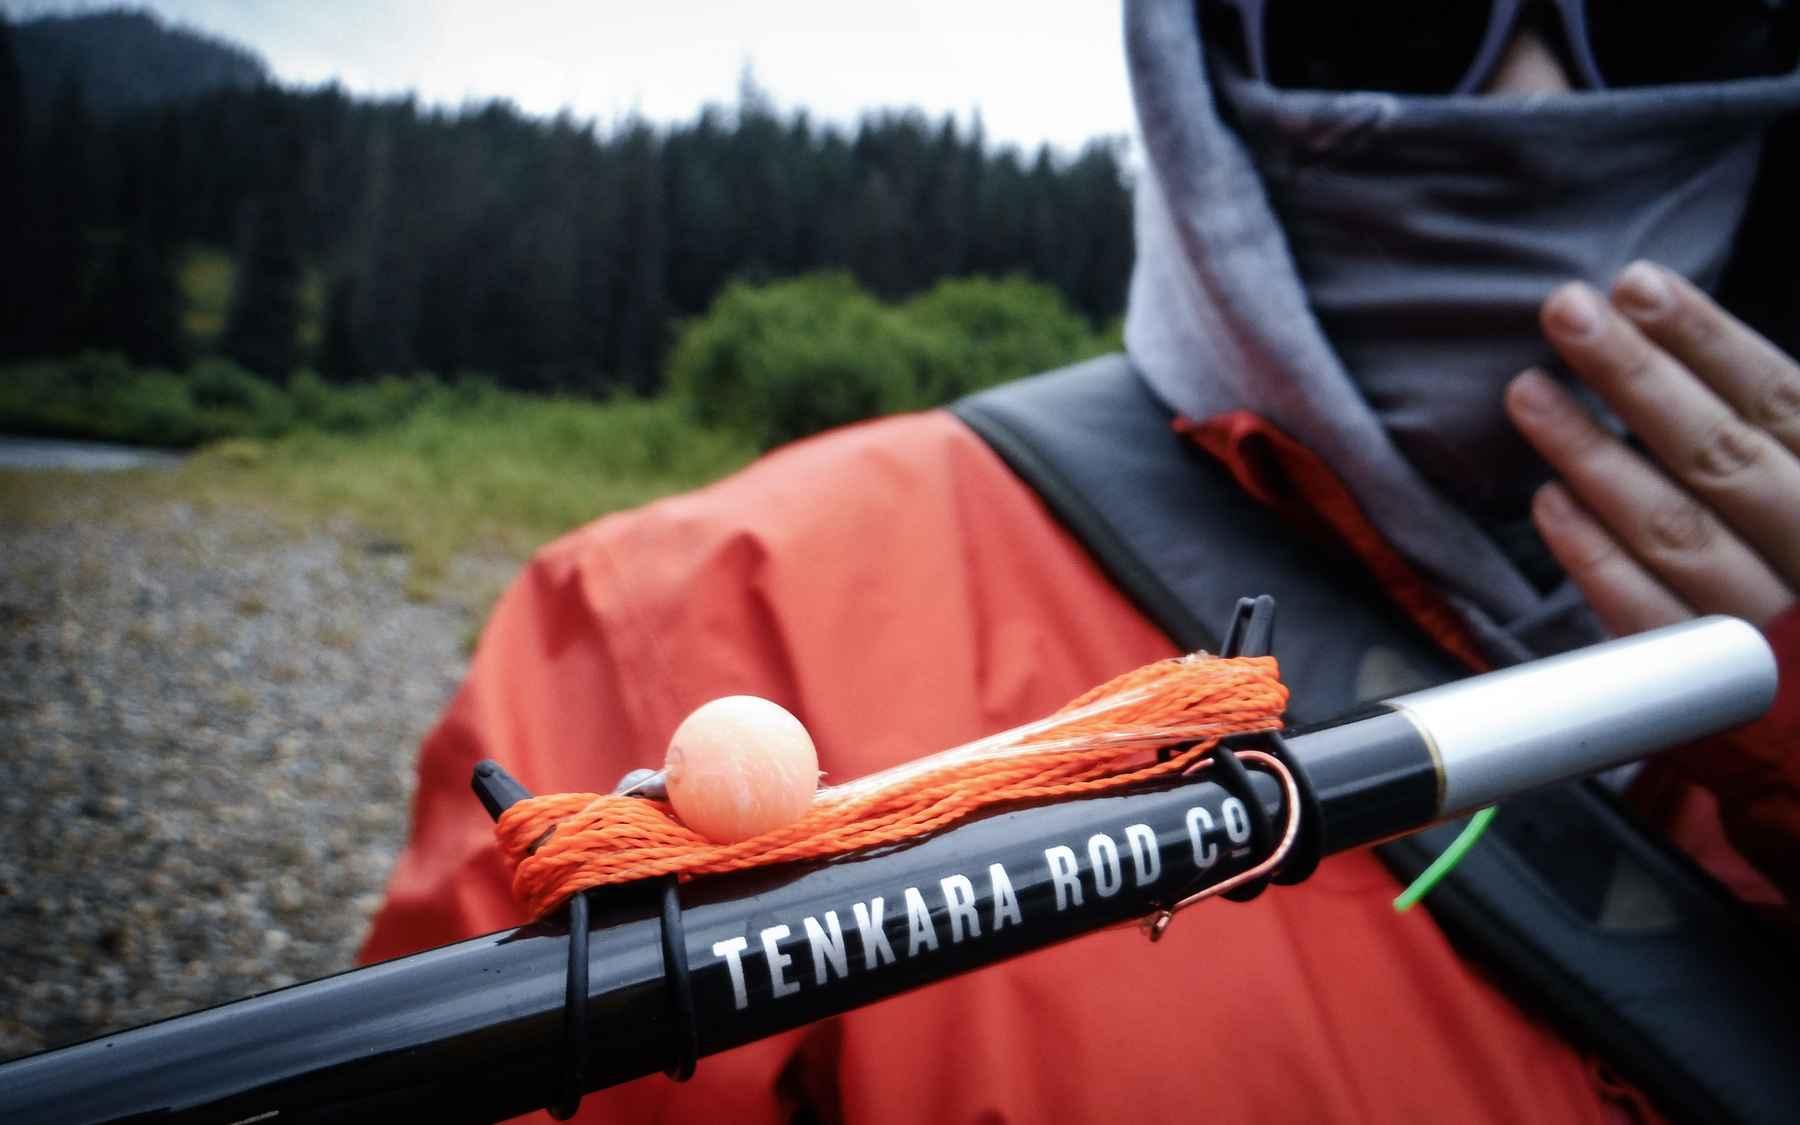 Review Tenkara Rod Co Teton Rod Hatch Magazine Fly Fishing Etc